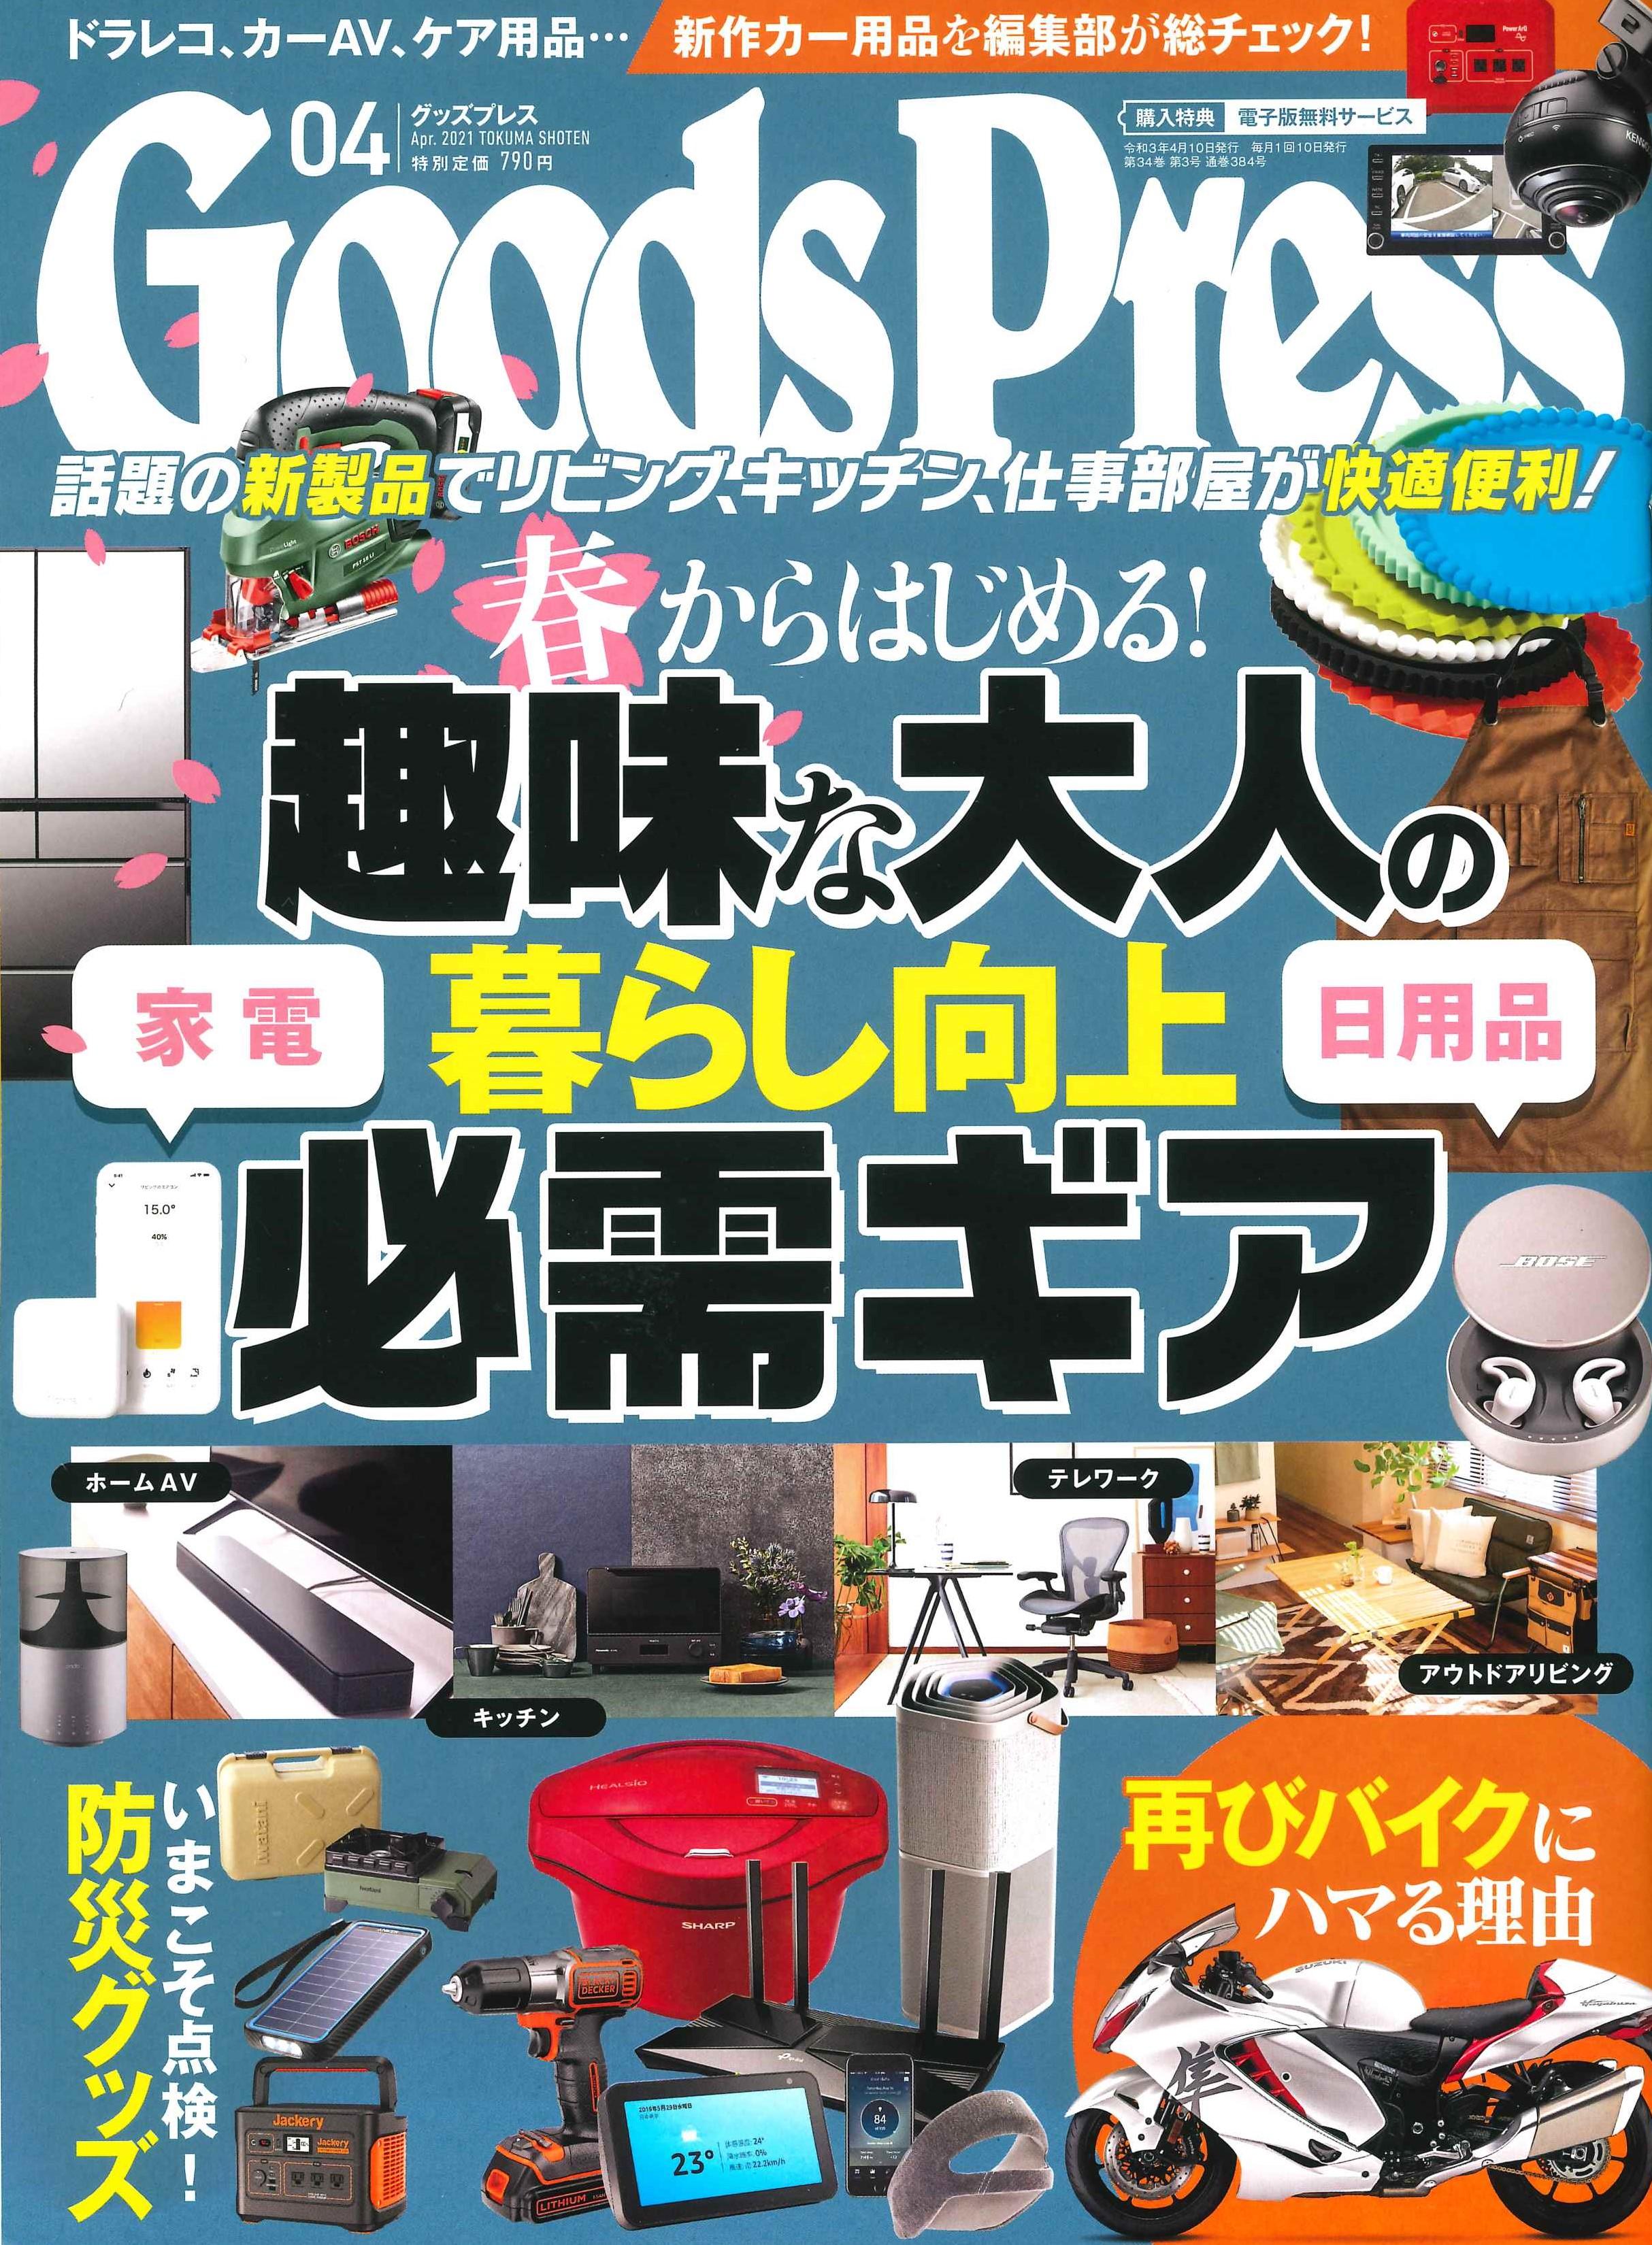 【GoodsPress 2021年4月号掲載】バイク用インカム B+COM SB6X